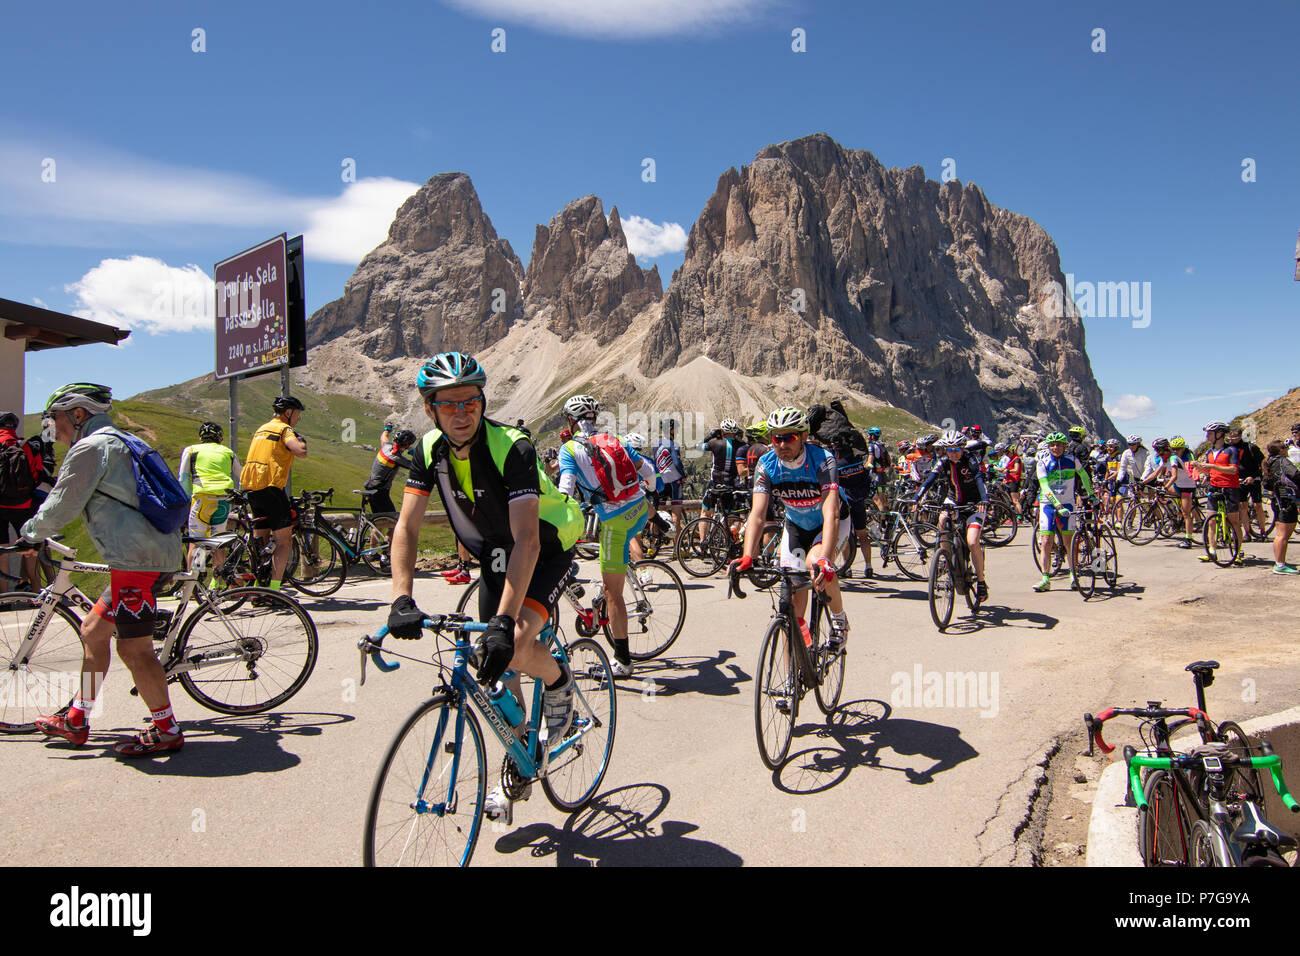 Sella Ronda Bike Day 2018 Sellaronda Cycling Dolomites Pordoi Pass Gardena Mountain Pass Sella Campolongo Tourism Sportive Cyclists Maratona Dolomiti - Stock Image